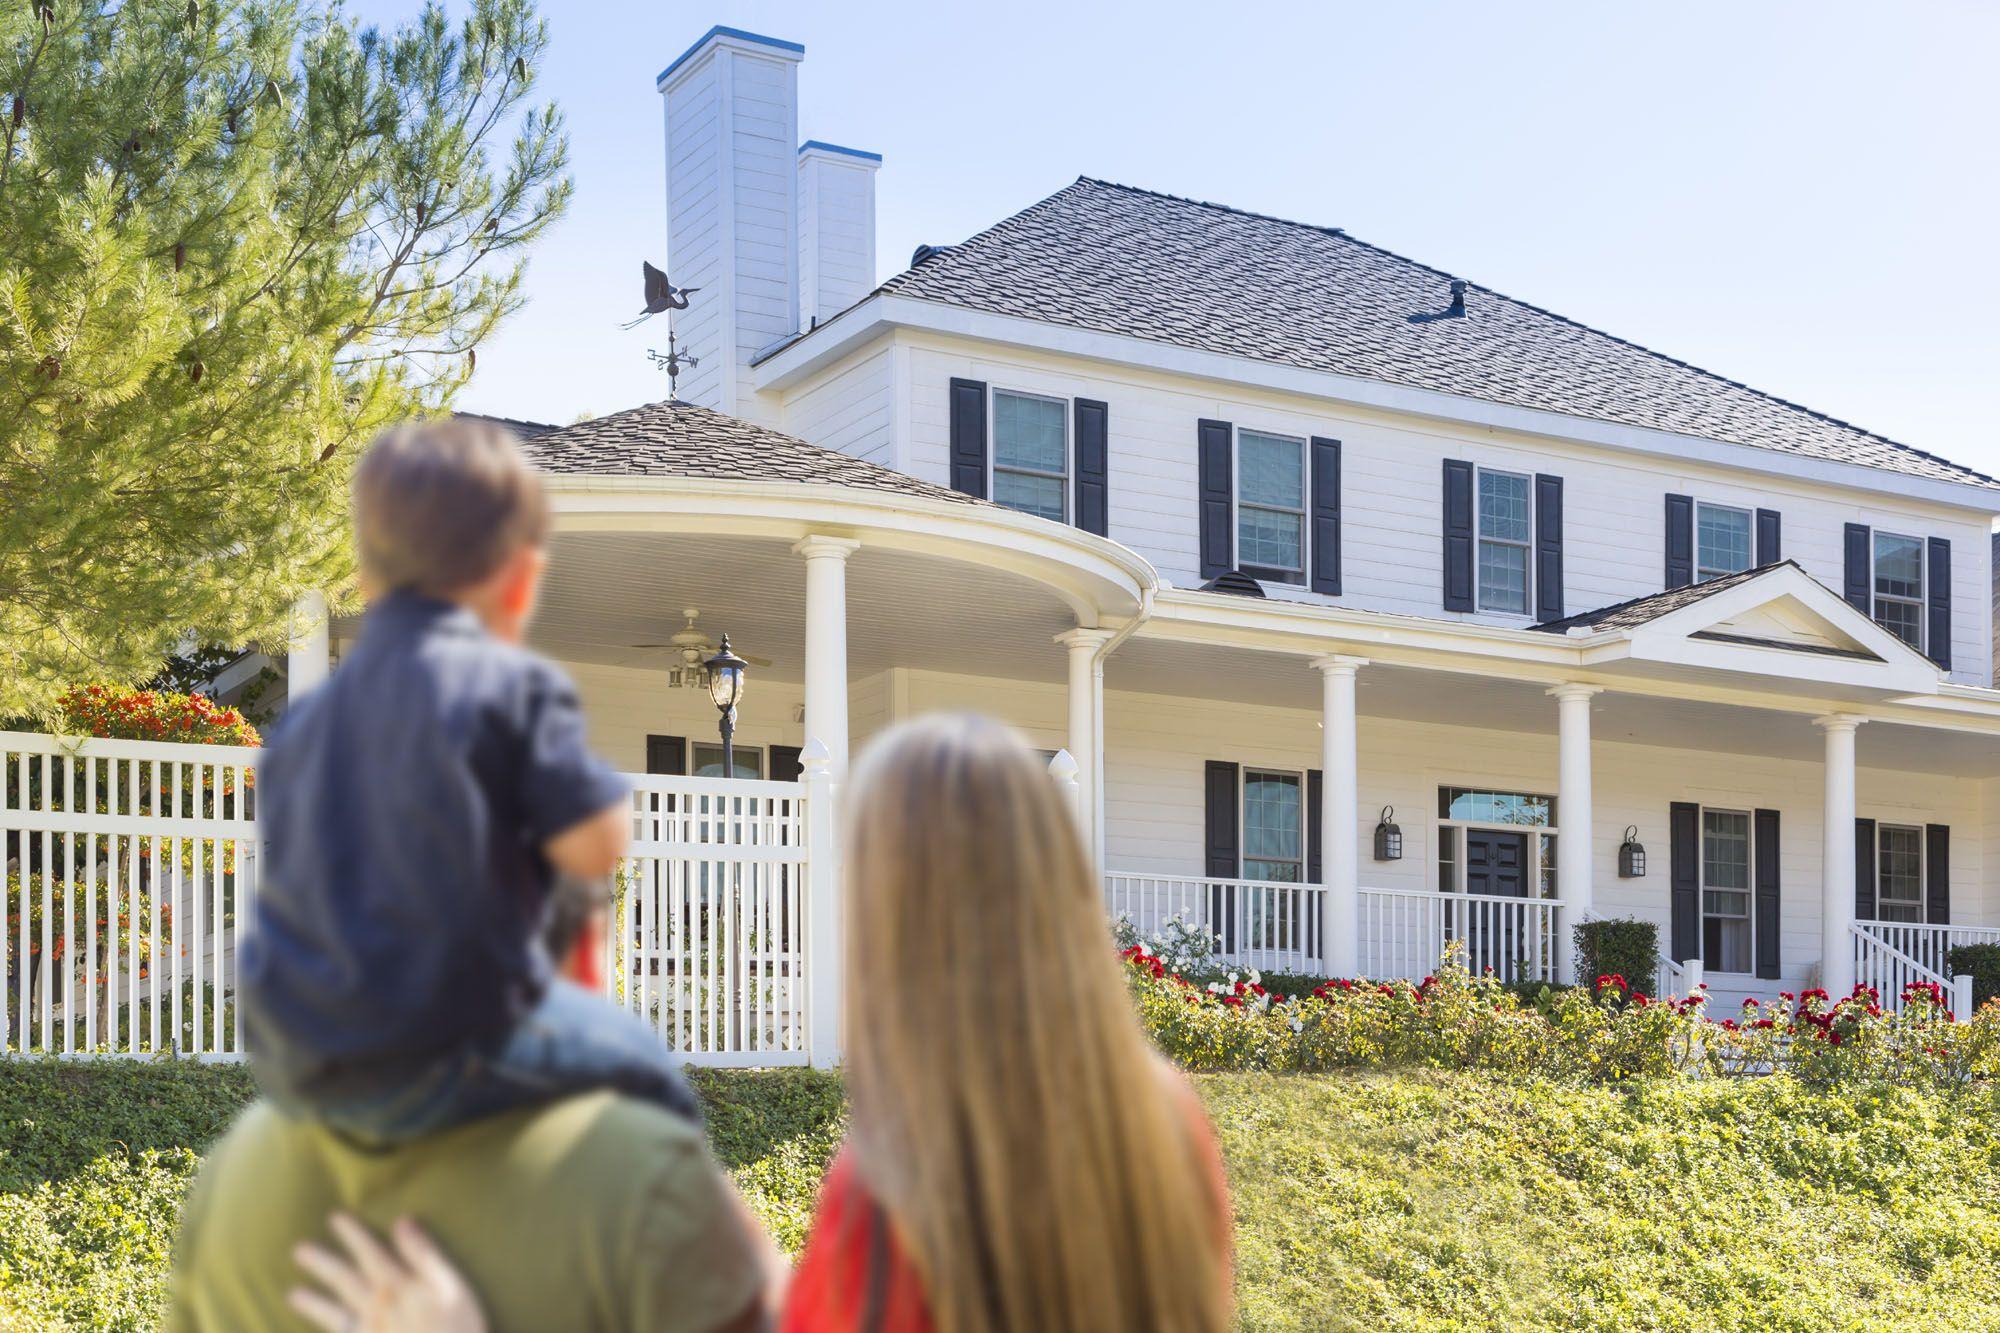 Db broker llc is a residential portfolio management